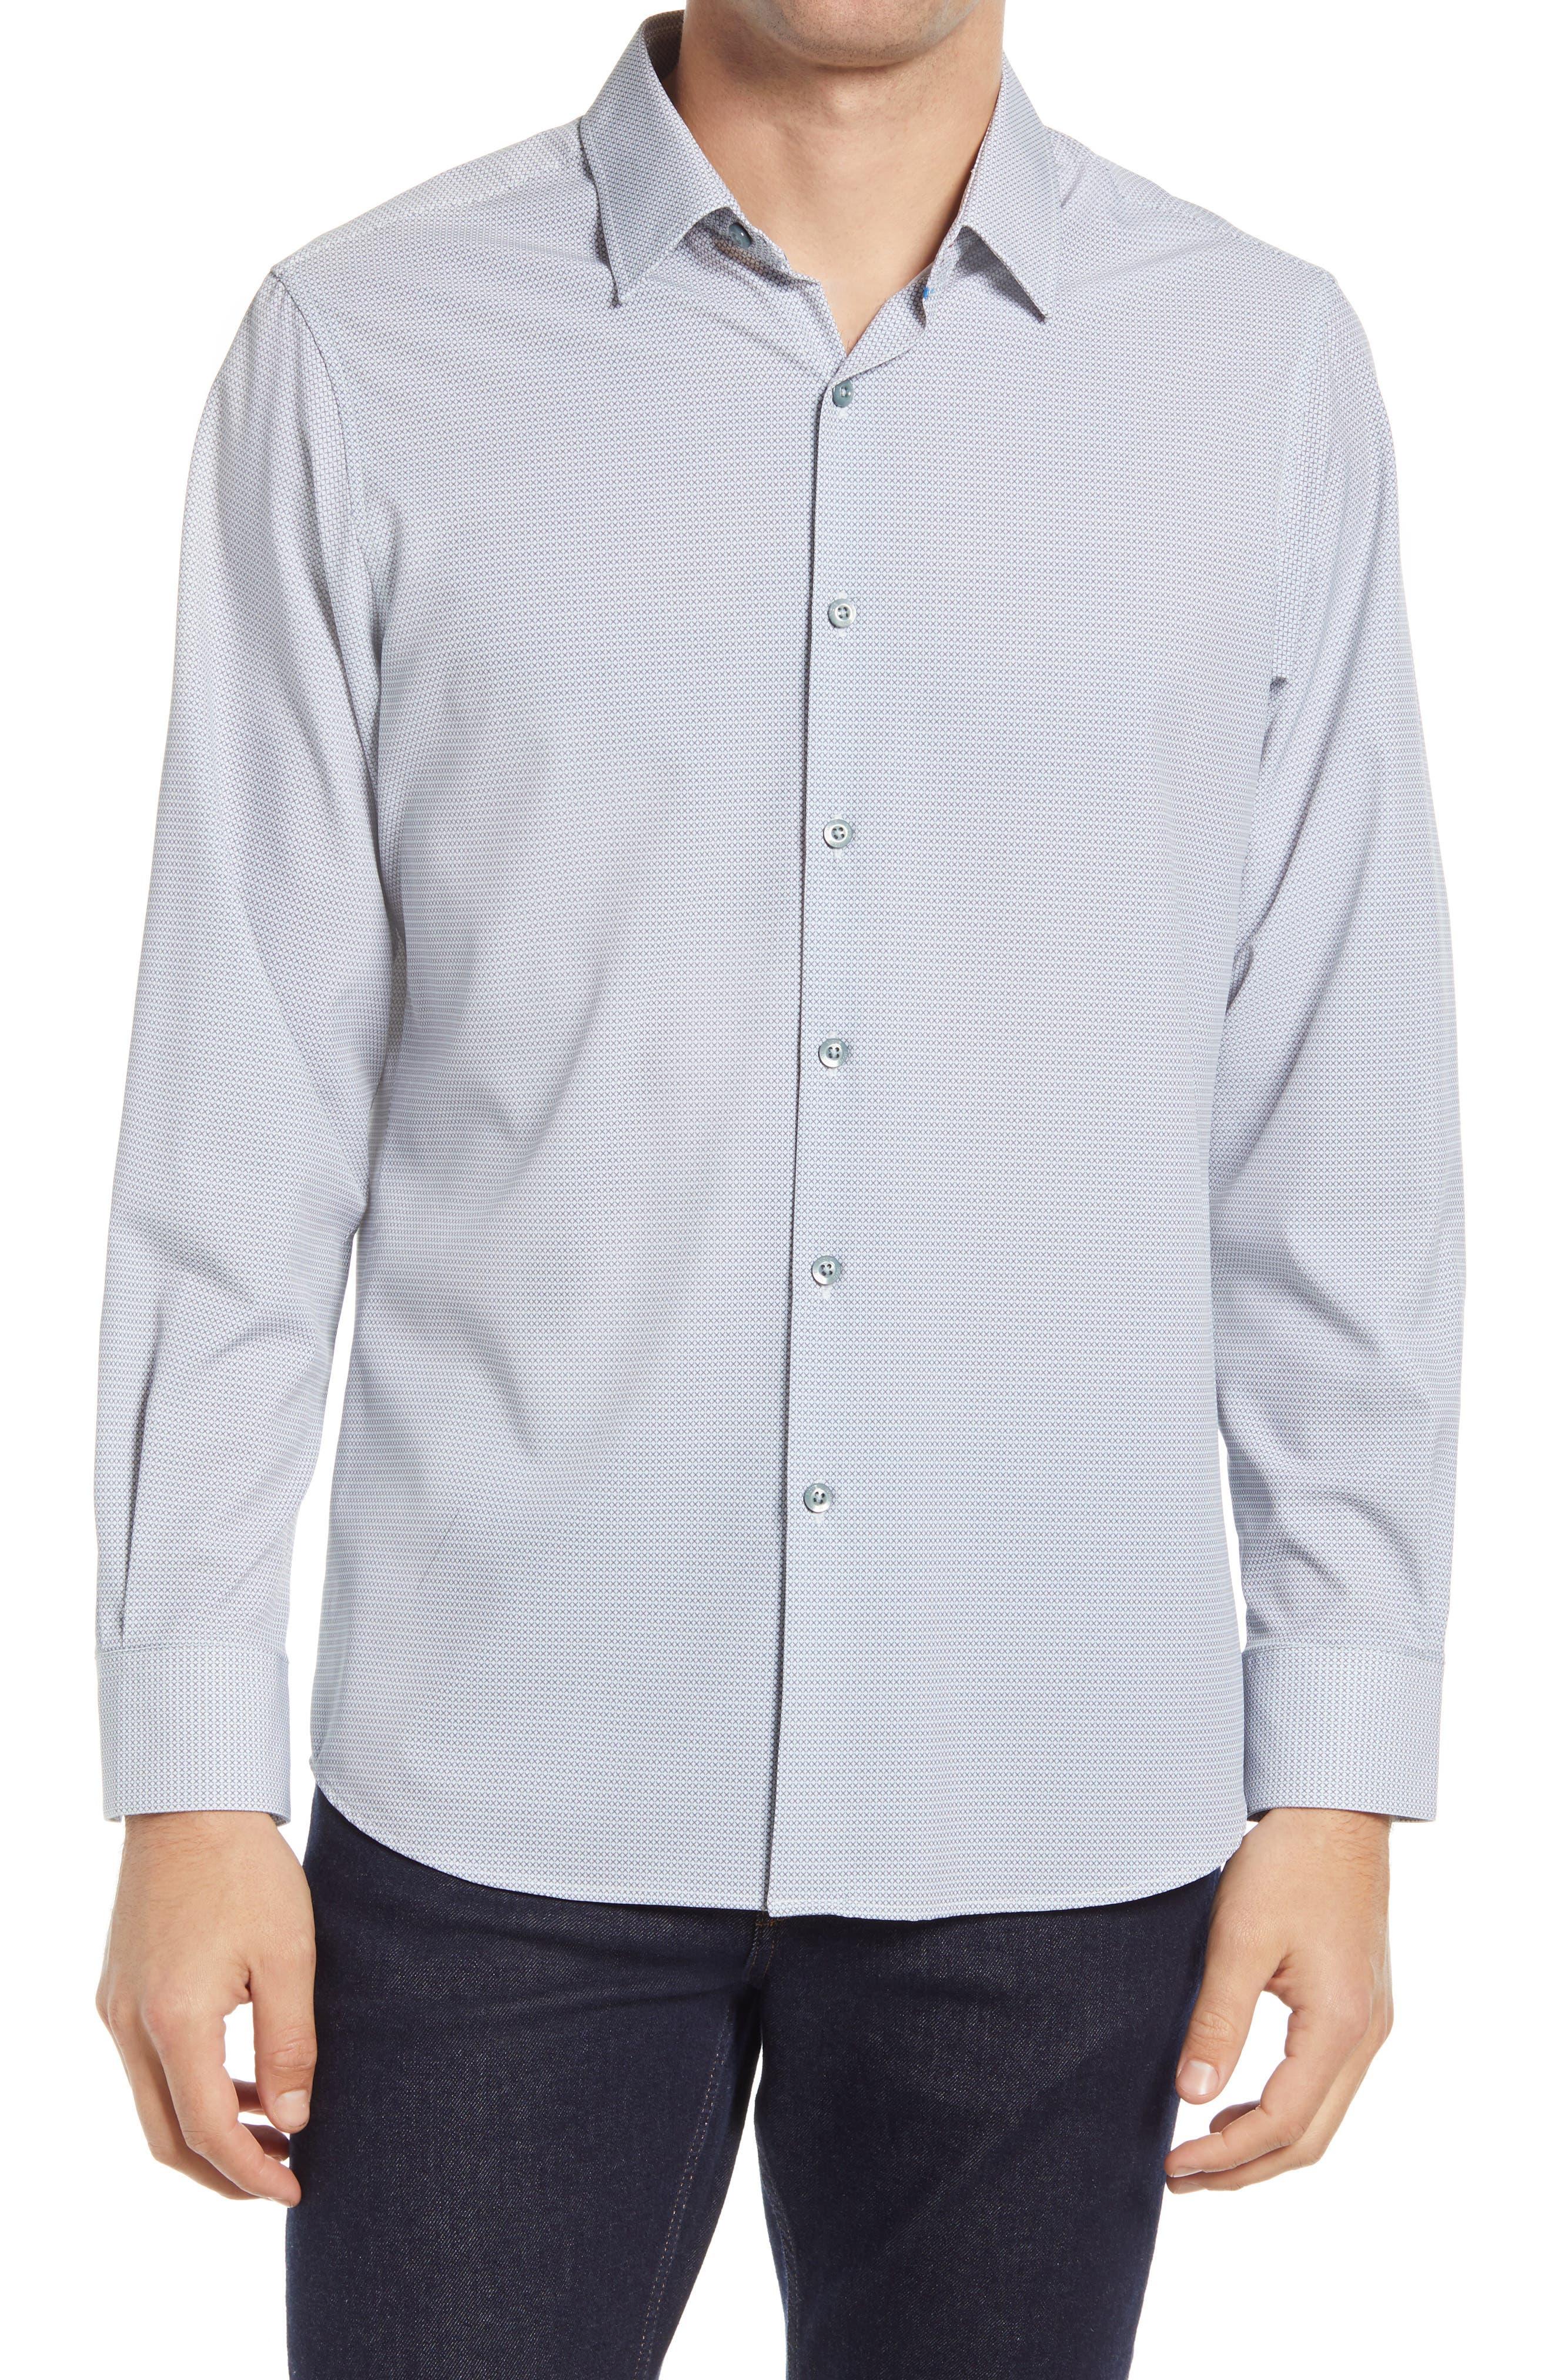 Trim Fit Print Button-Up Performance Shirt